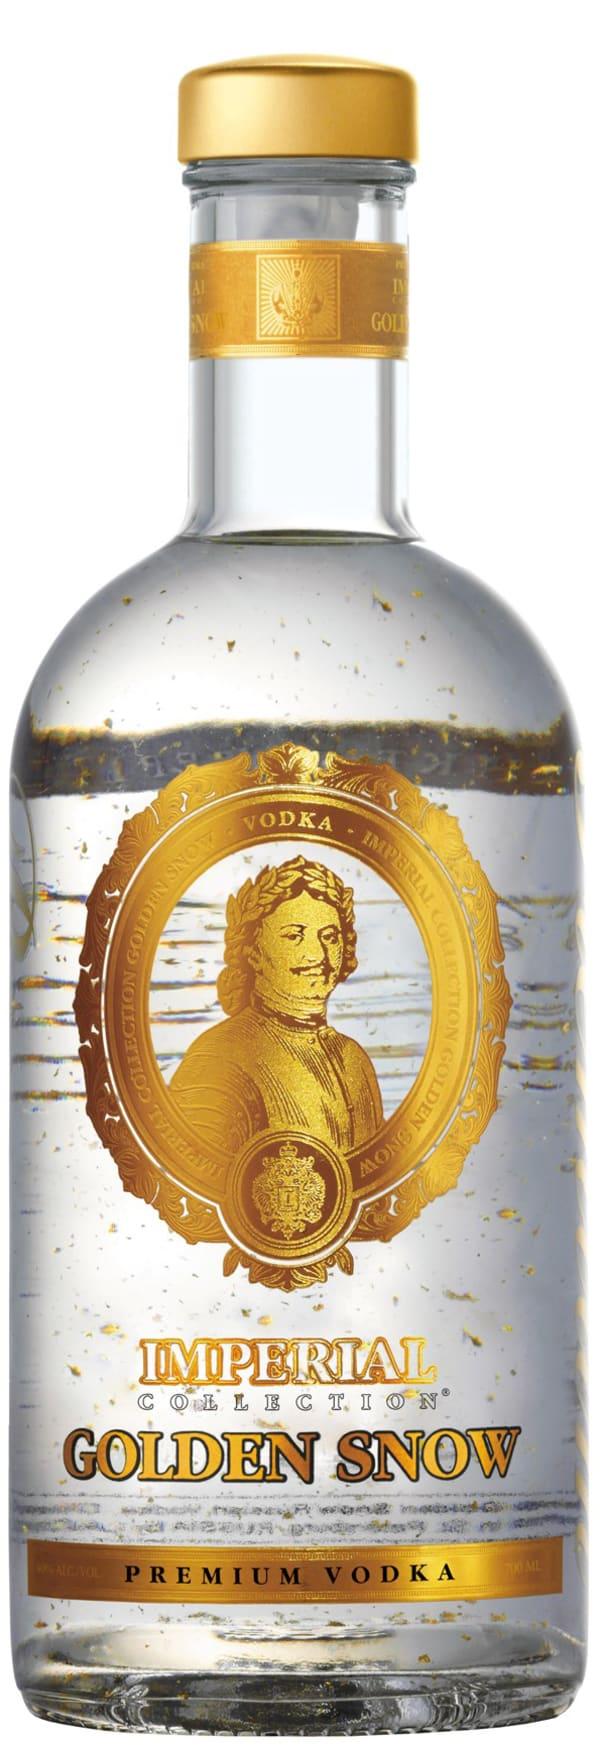 Imperial Golden Snow Vodka